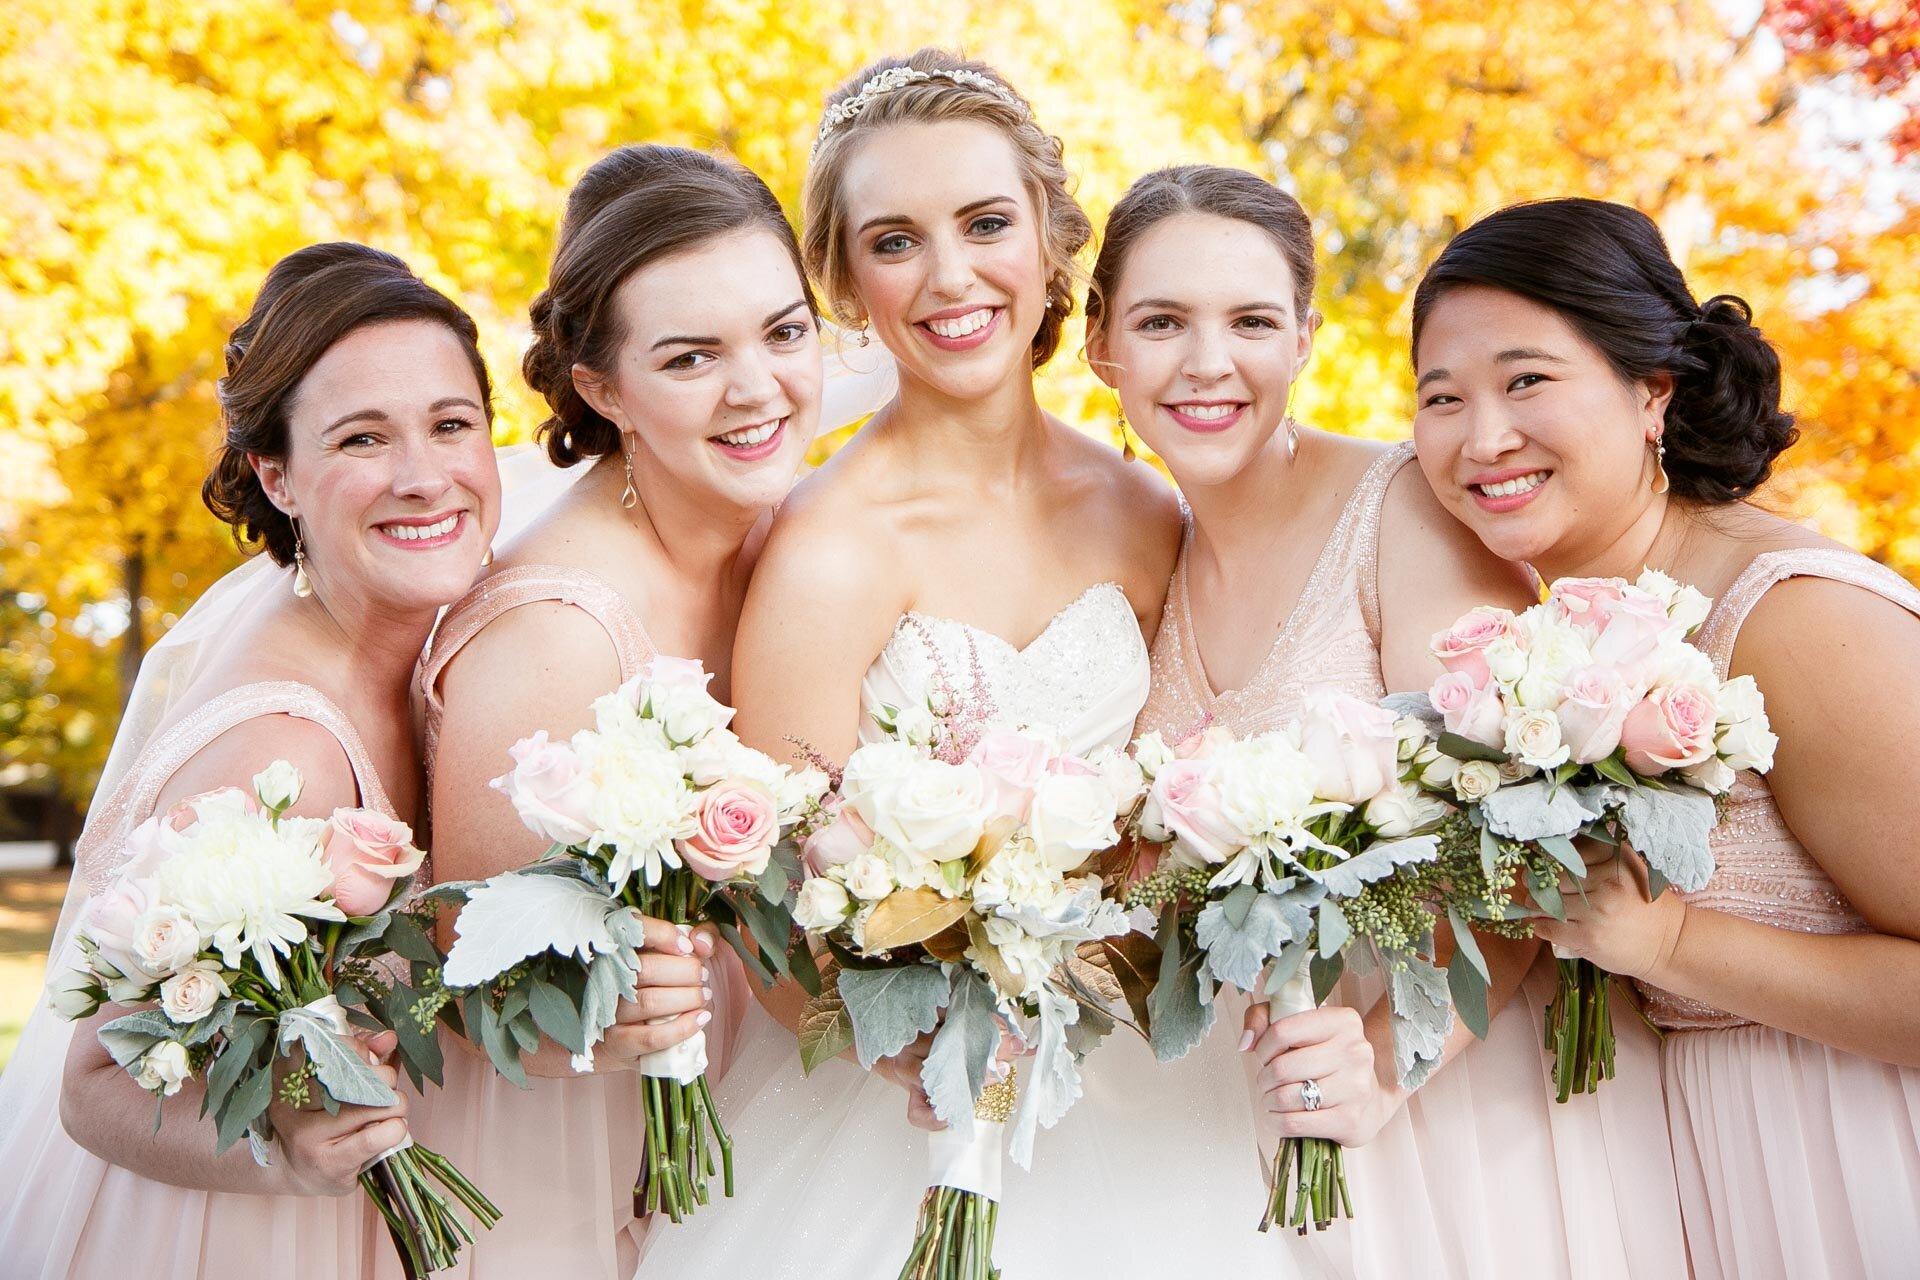 adam-shea-photography-fall-autumn-lighting-engagement-wedding-photos-adam-shea-photography-green-bay-appleton-neenah-photographer-06.jpg